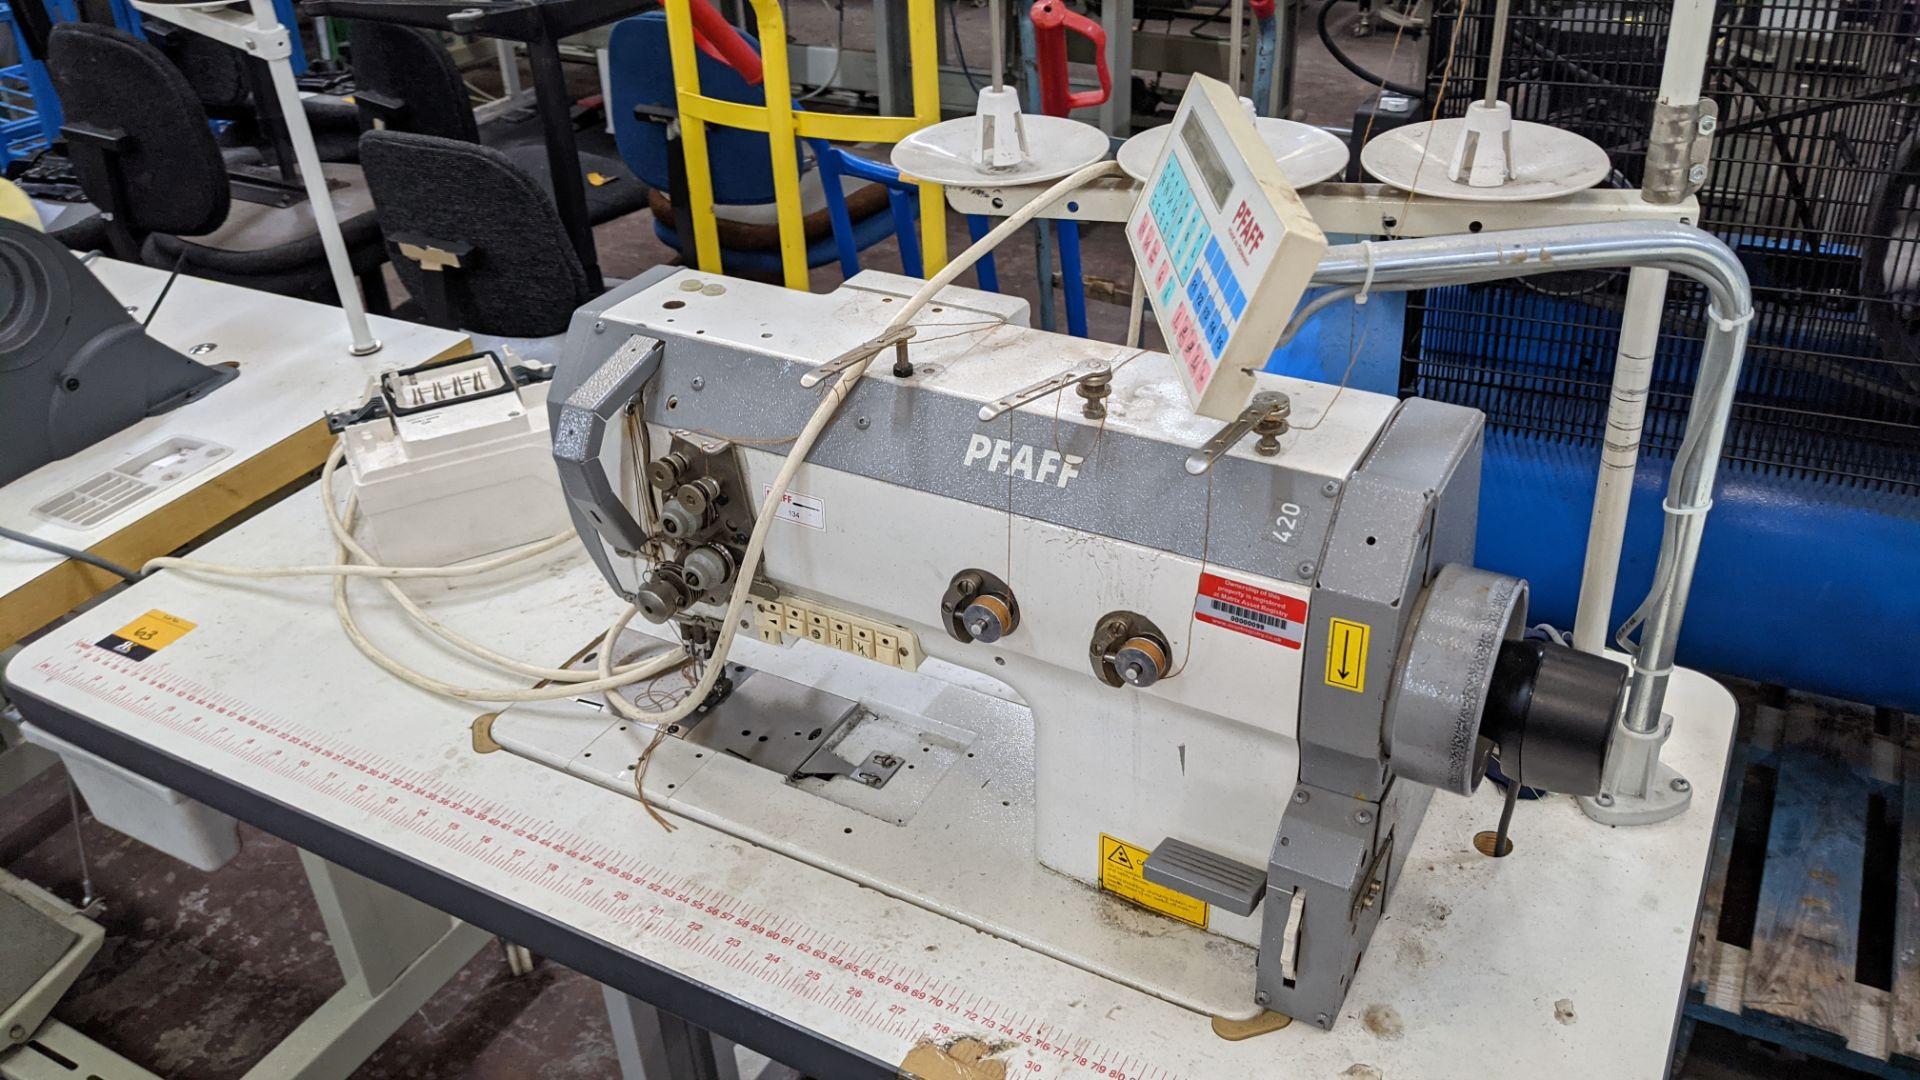 Pfaff twin needle sewing machine, model 422 - Image 4 of 17